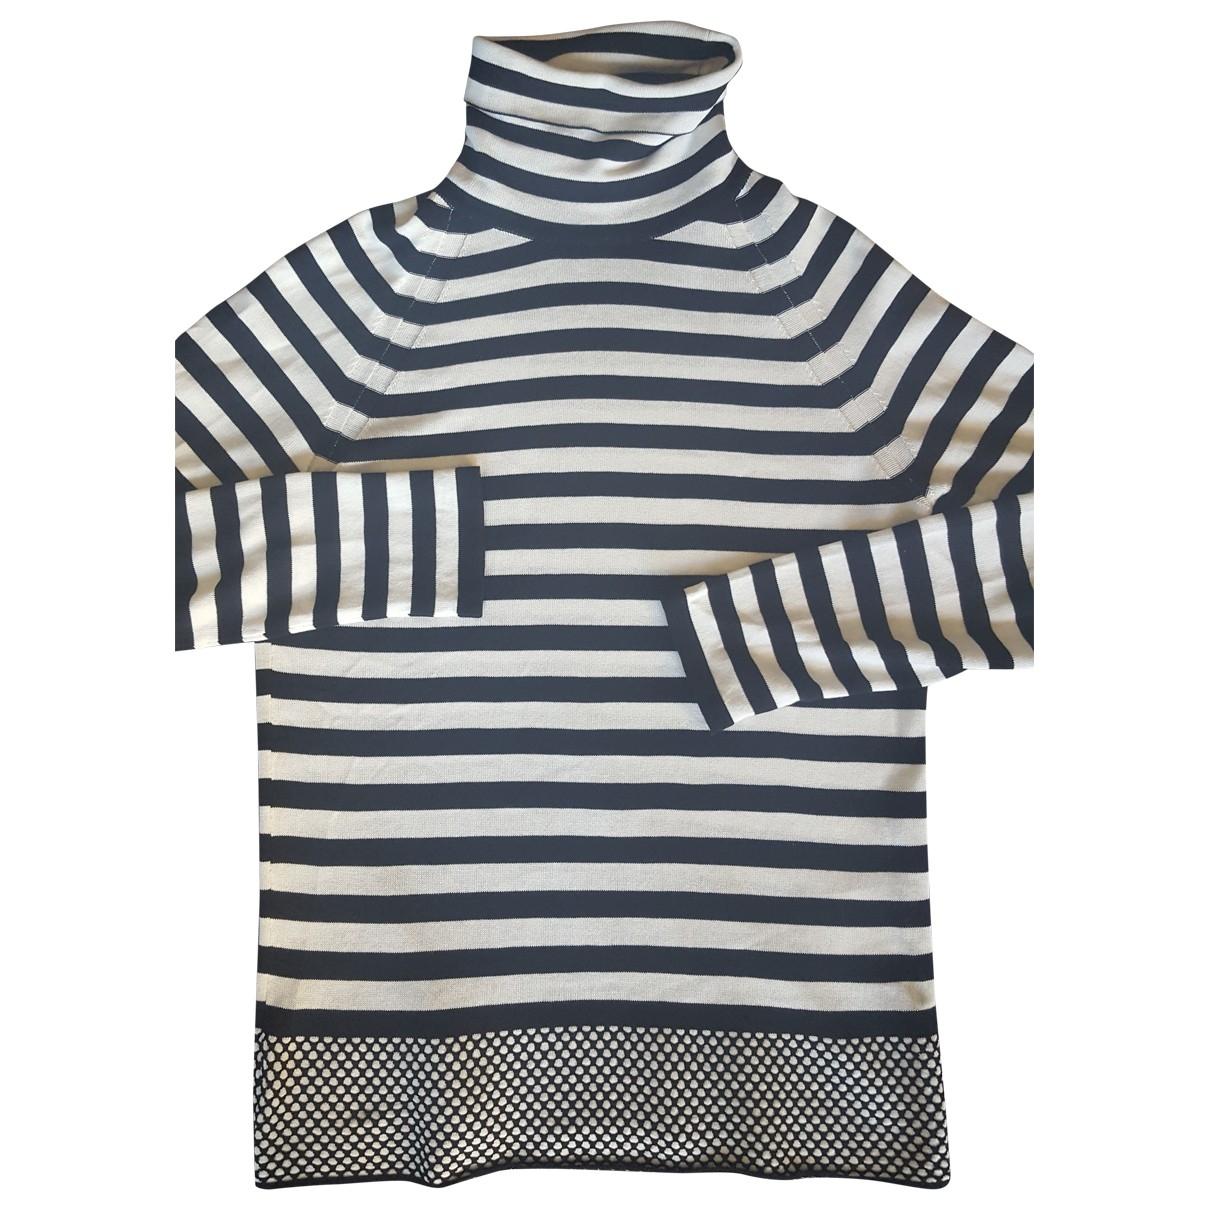 Marc Jacobs \N Black Cotton Knitwear & Sweatshirts for Men M International